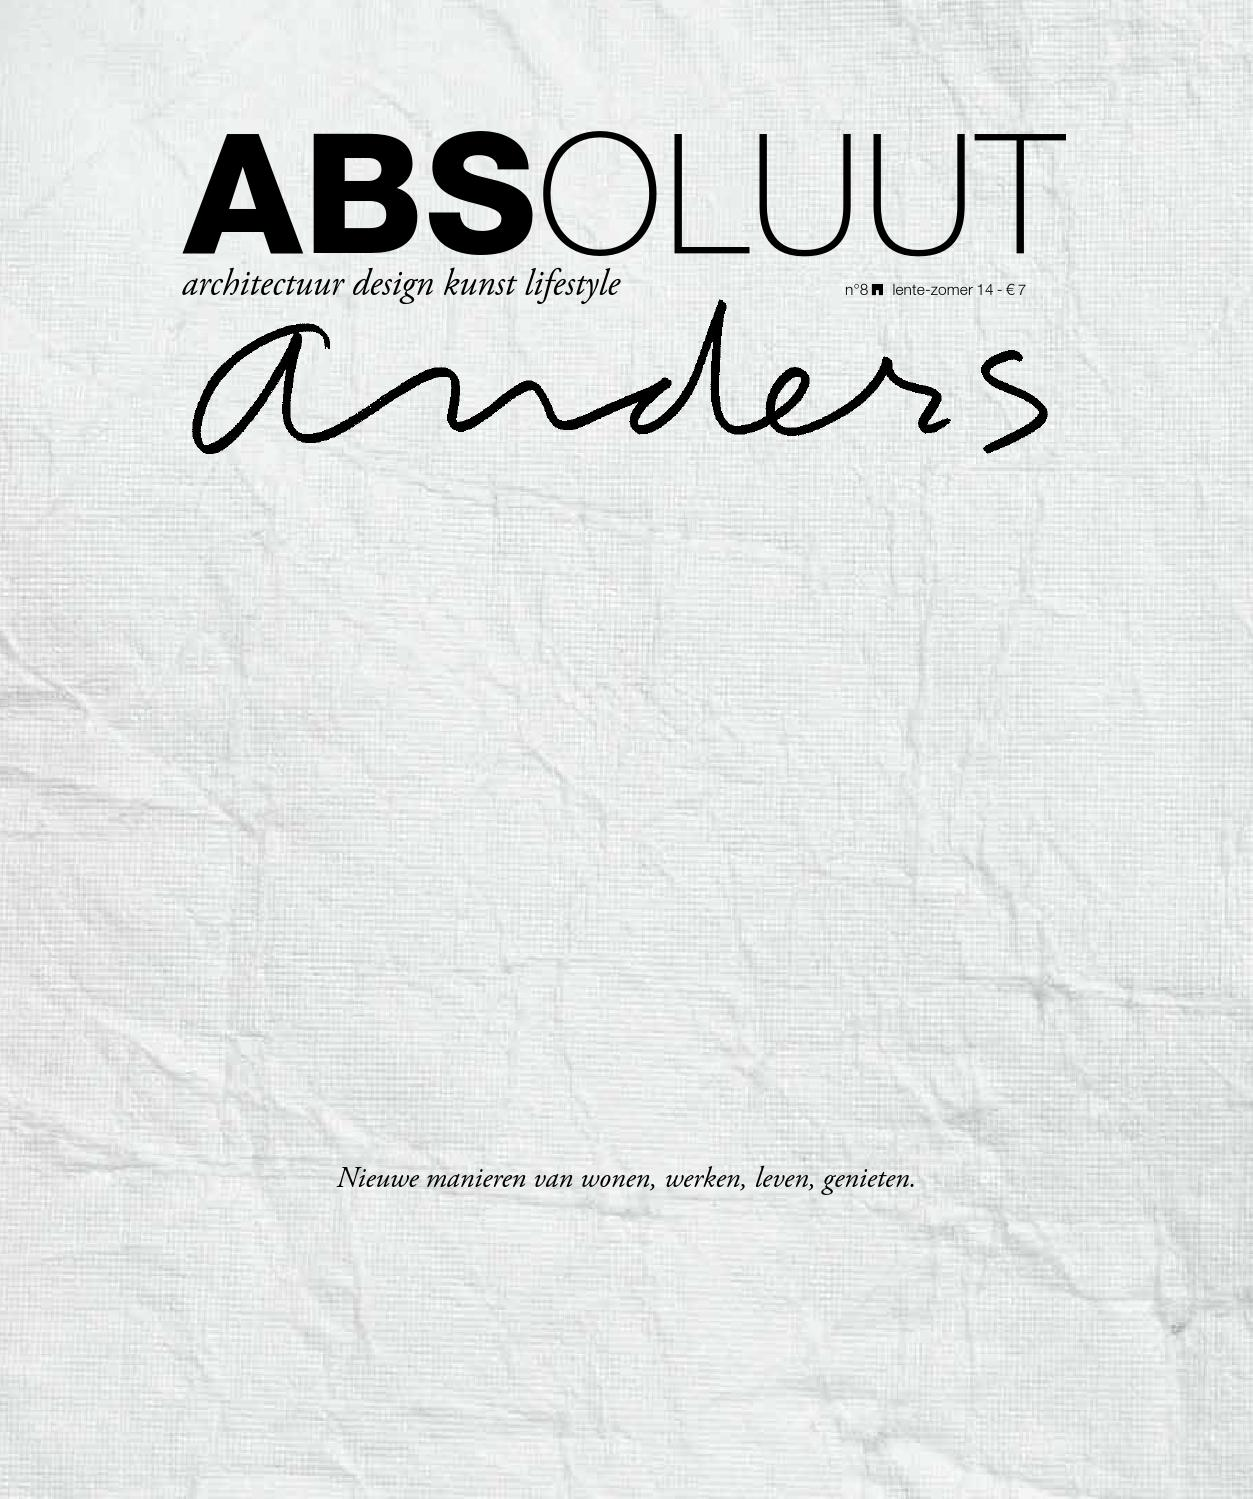 absoluut 8 by absoluut magazine issuu